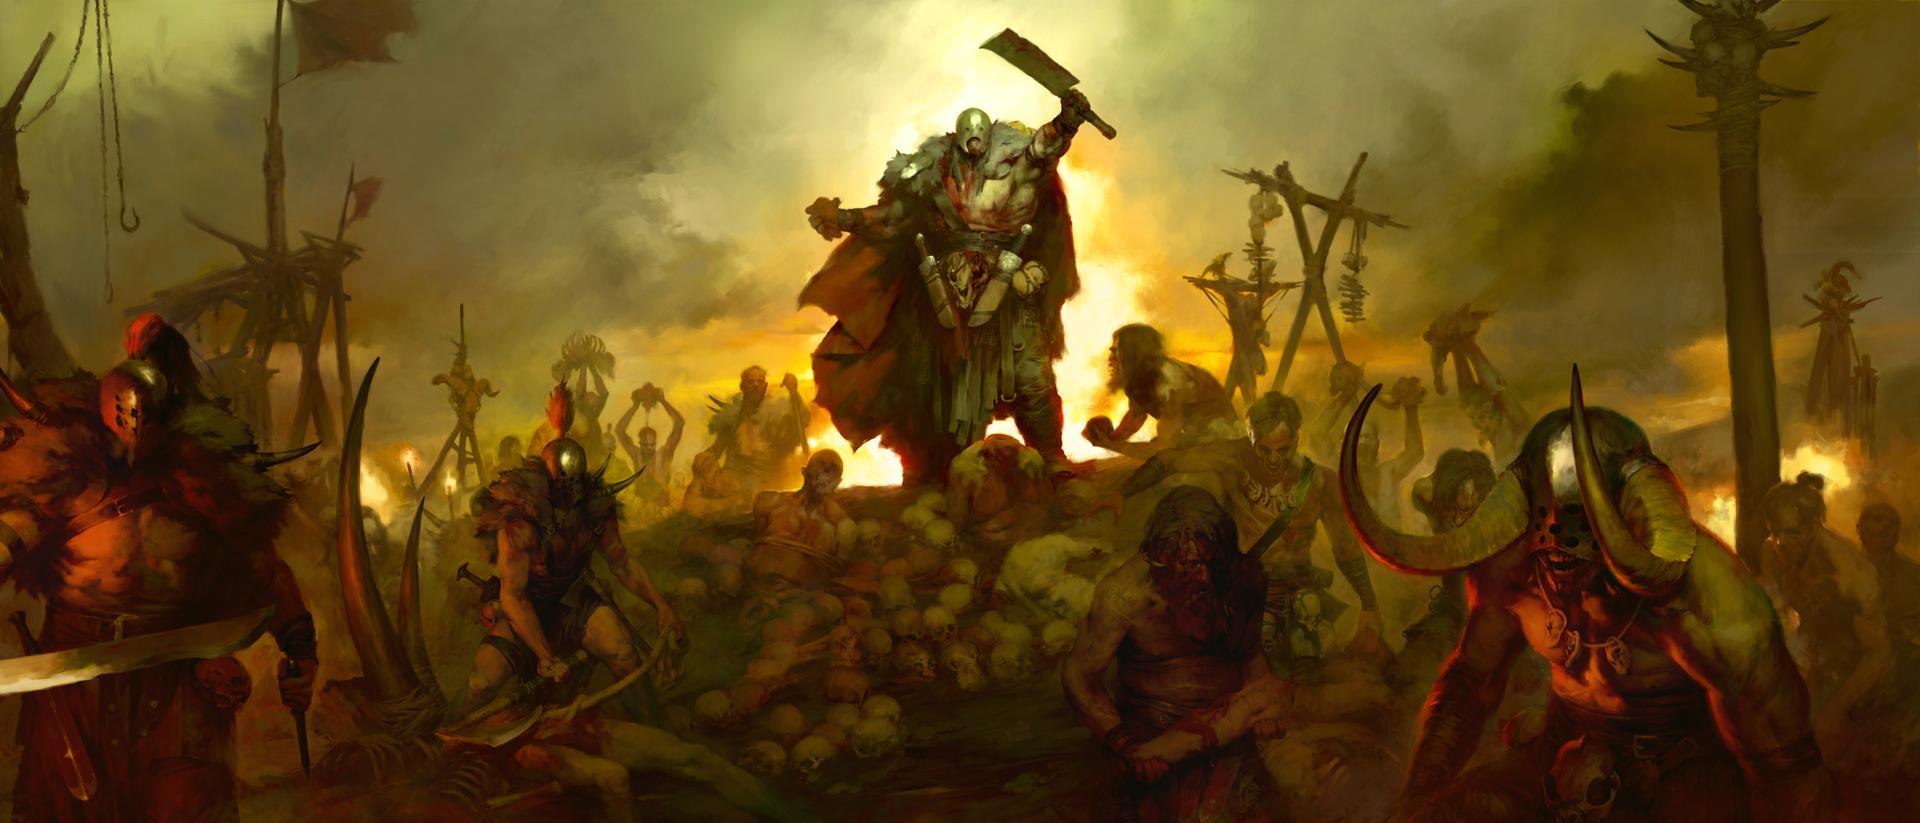 Nový trailer na Diablo IV ukazuje frakci kanibalů